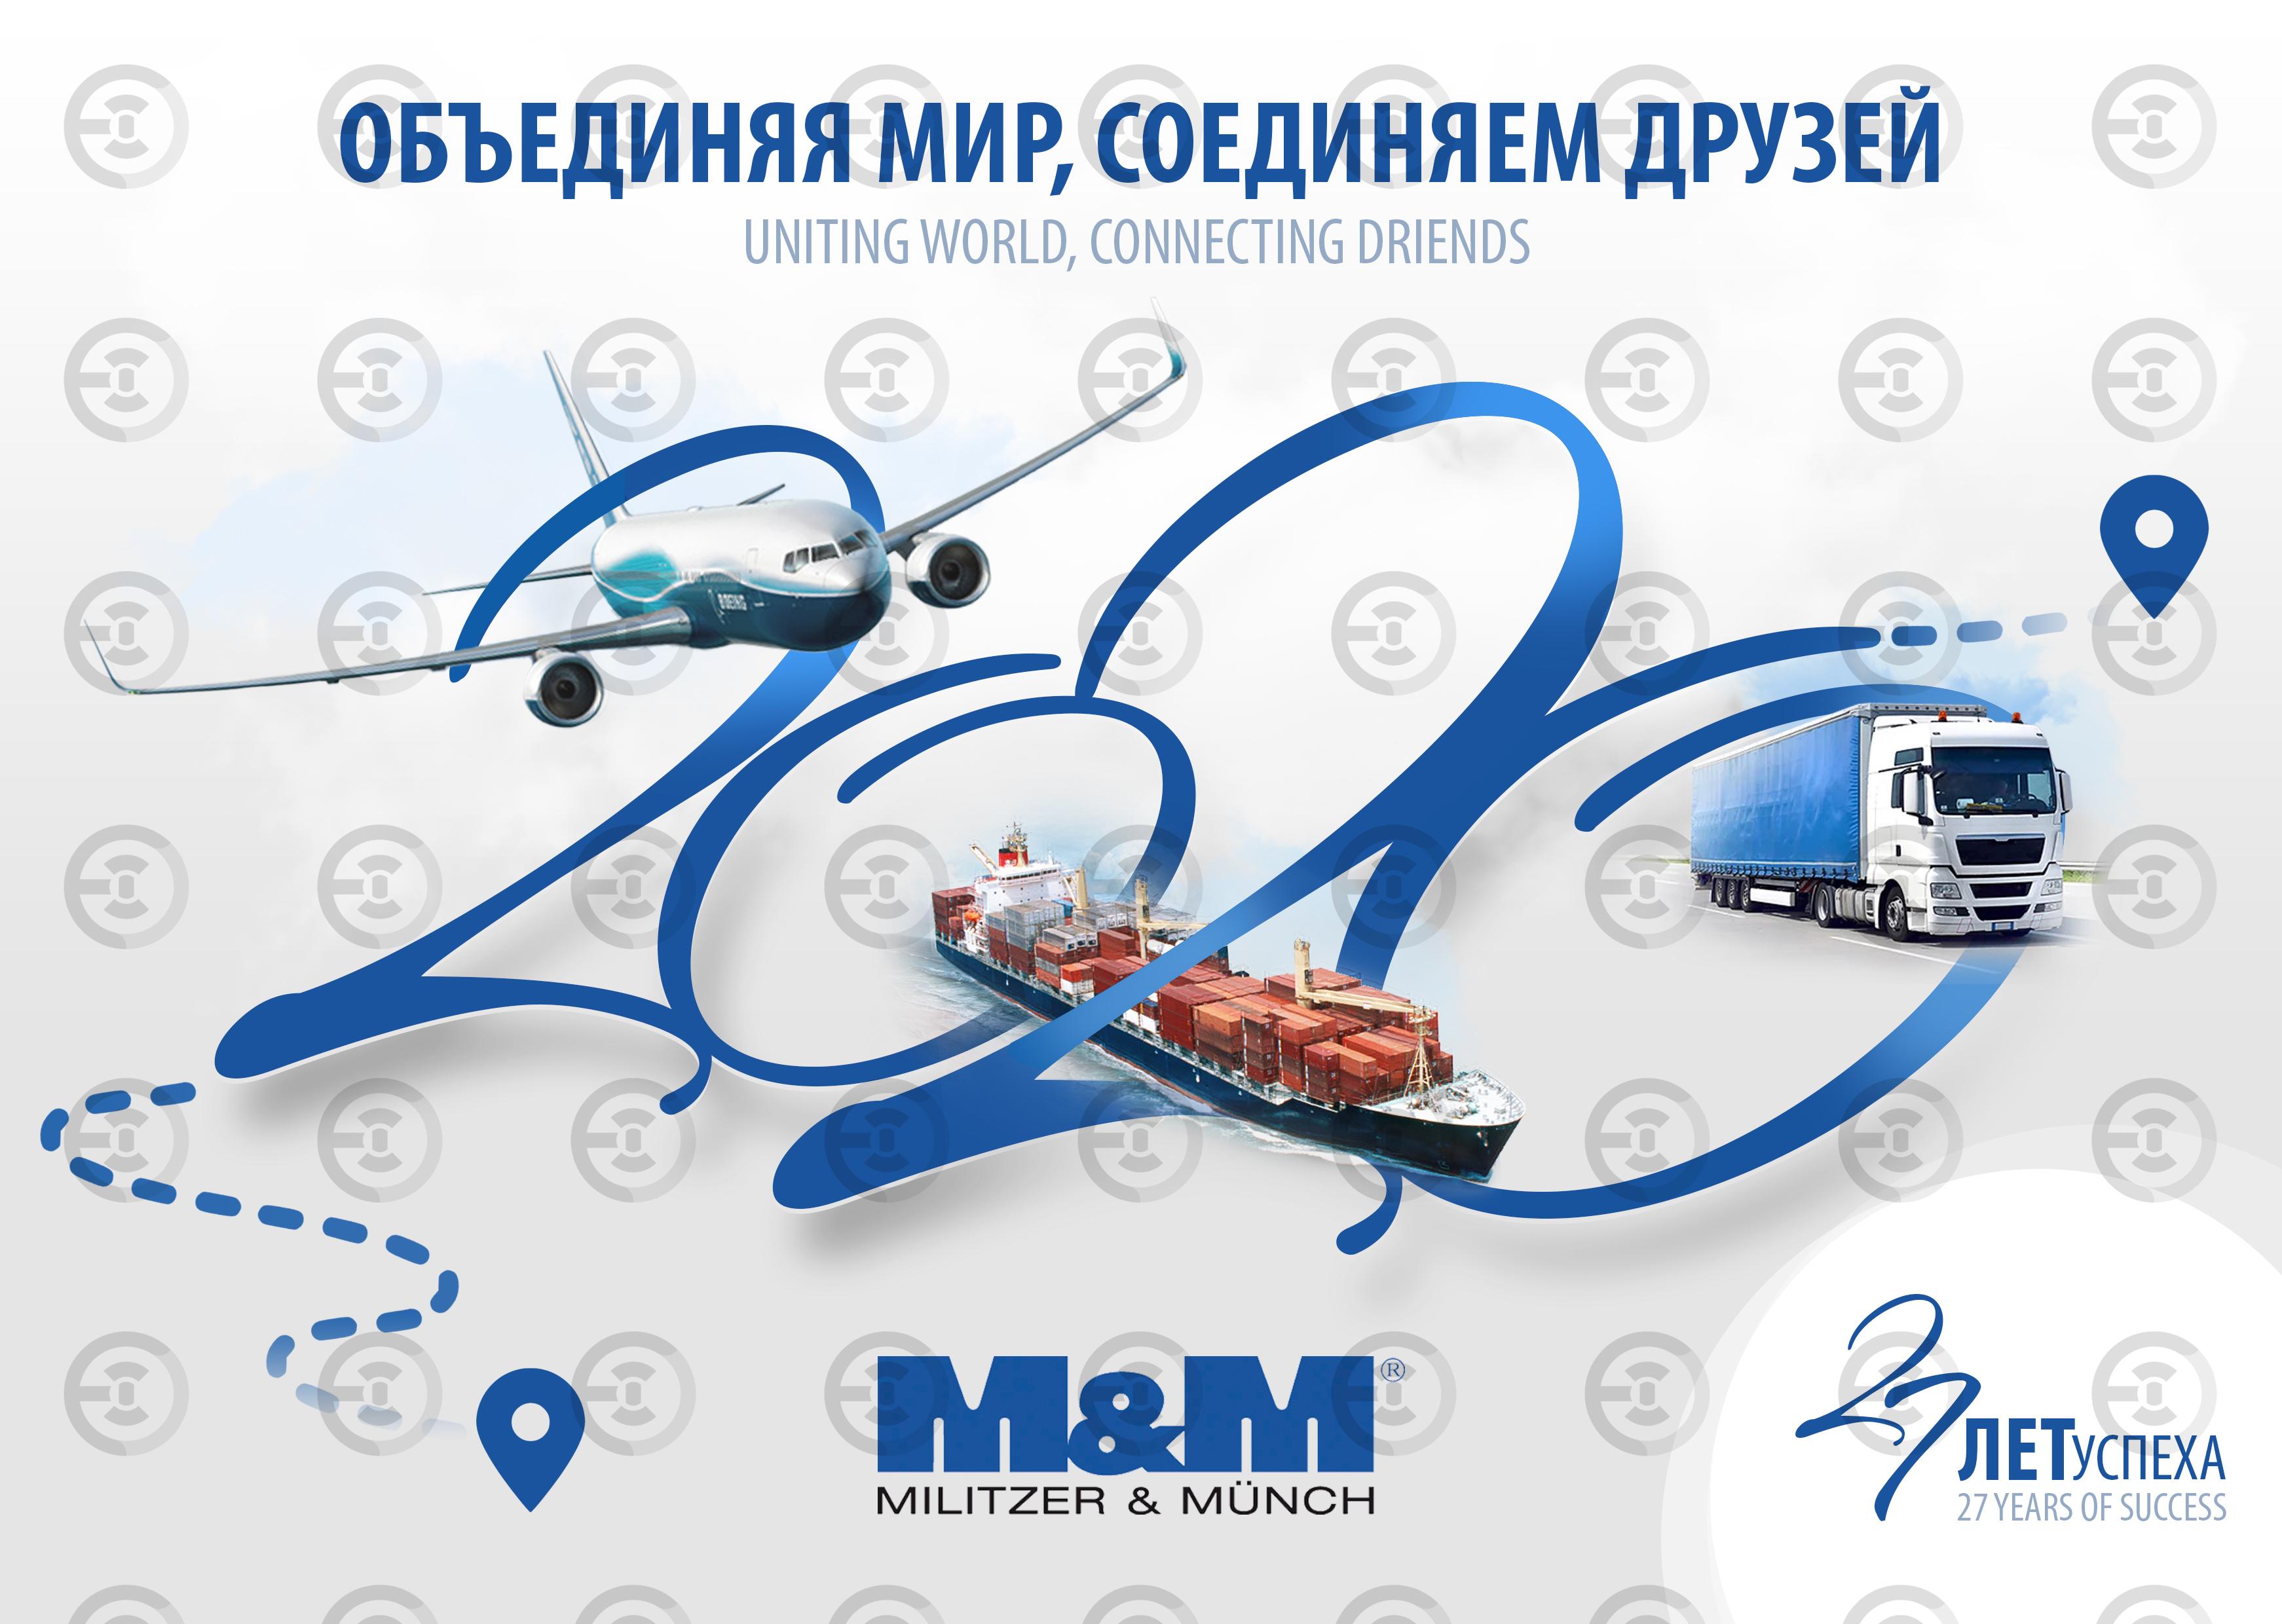 mm_design_295x210.jpg